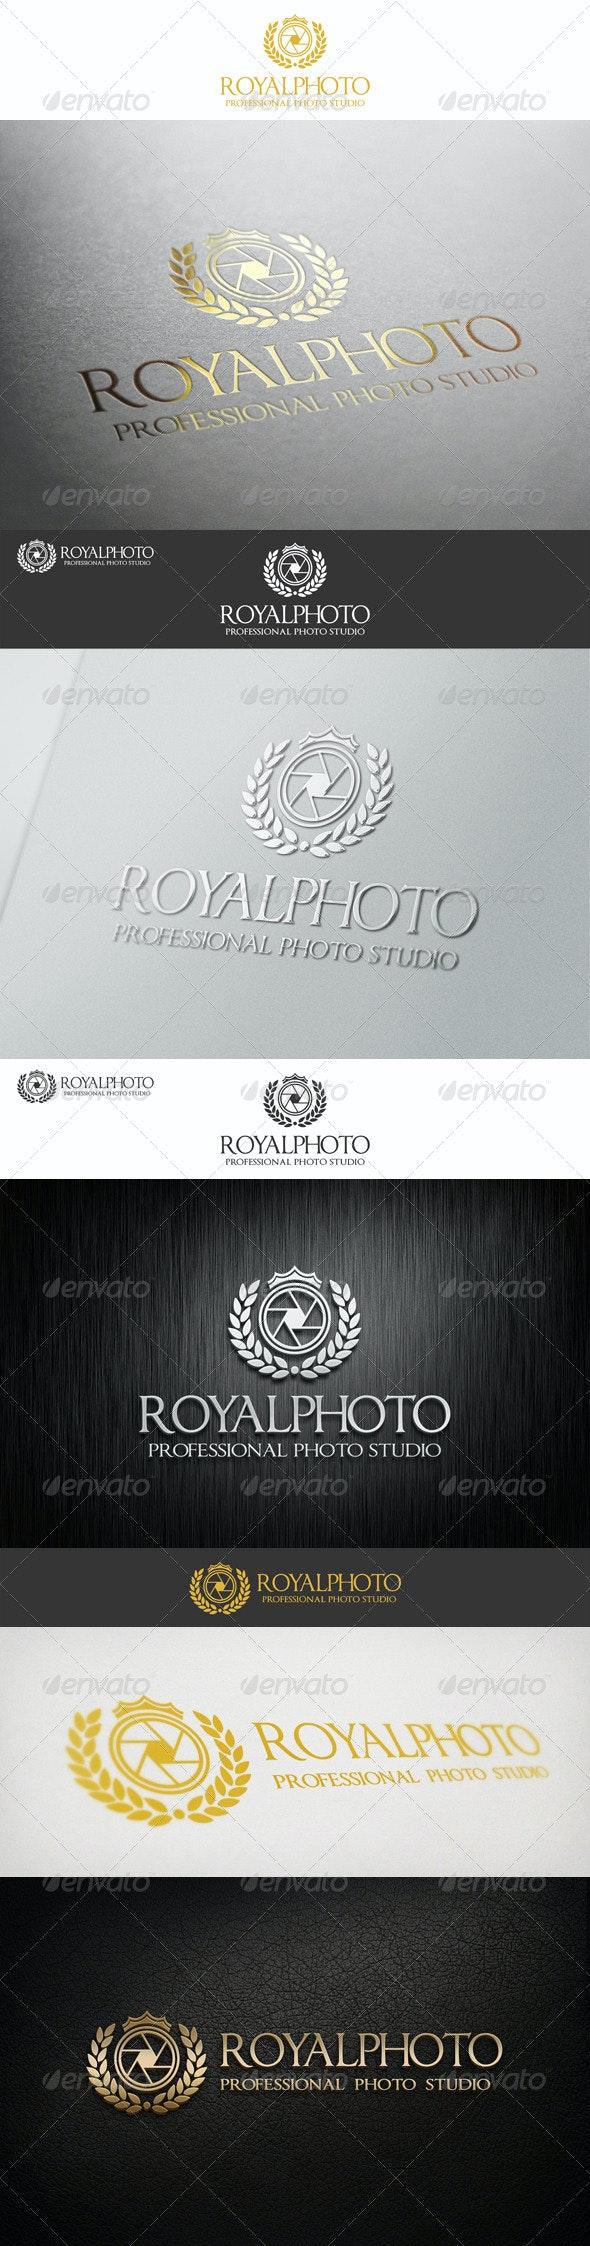 Royal Photo Professional Studio Logo - Crests Logo Templates